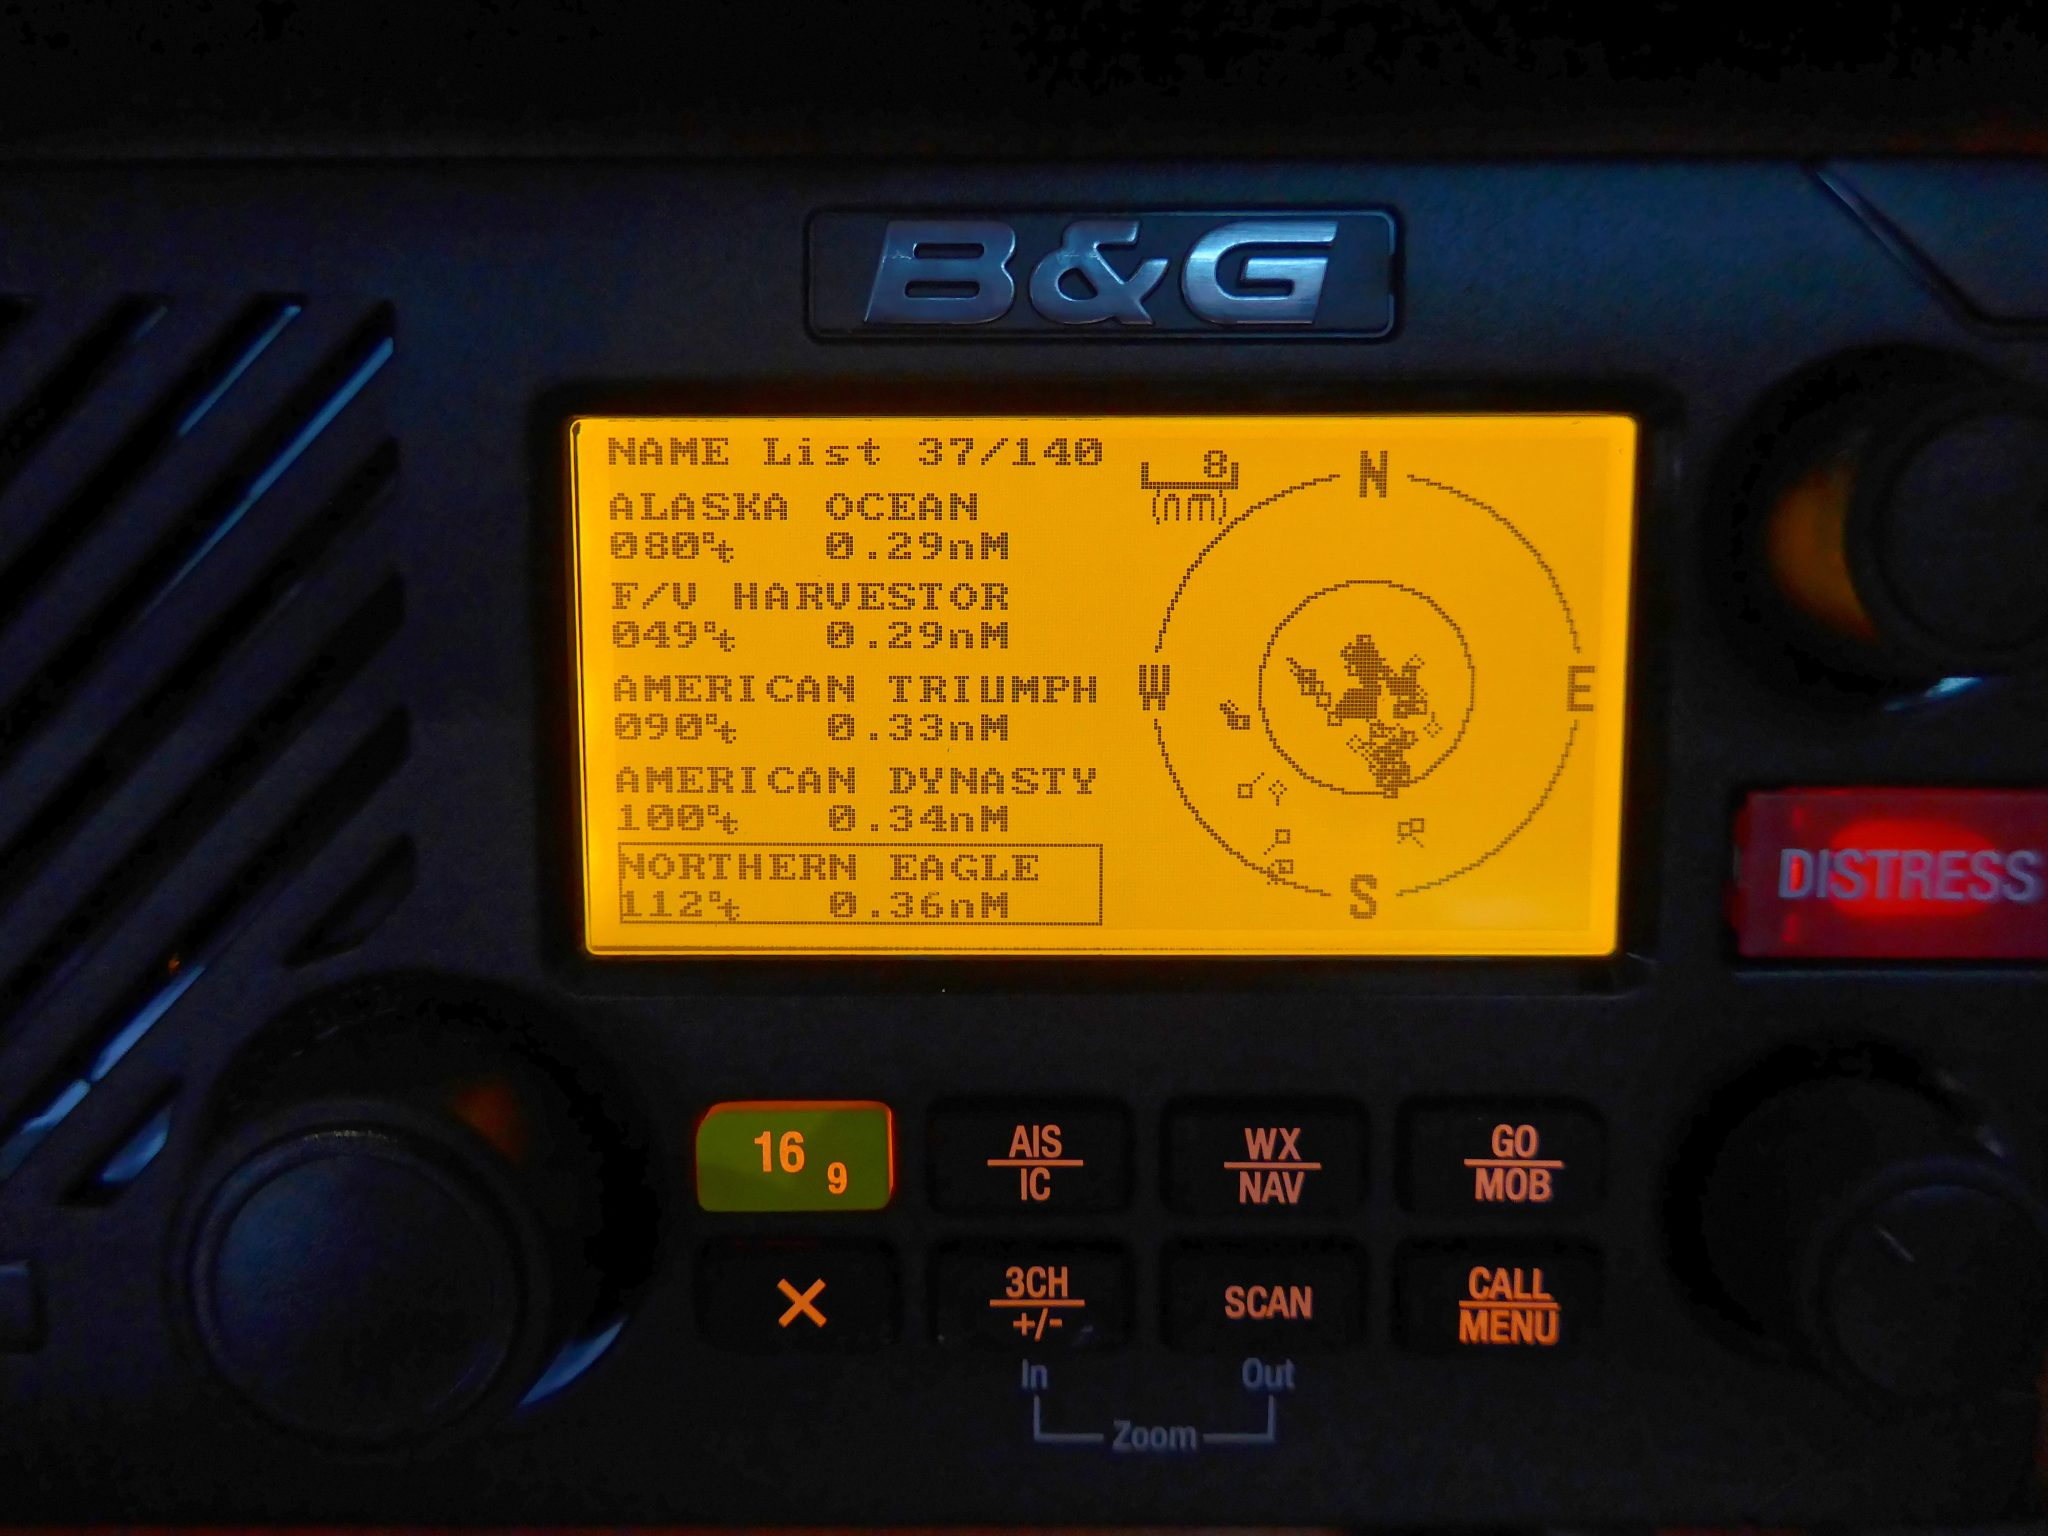 B&G V50 VHF AIS target list and map